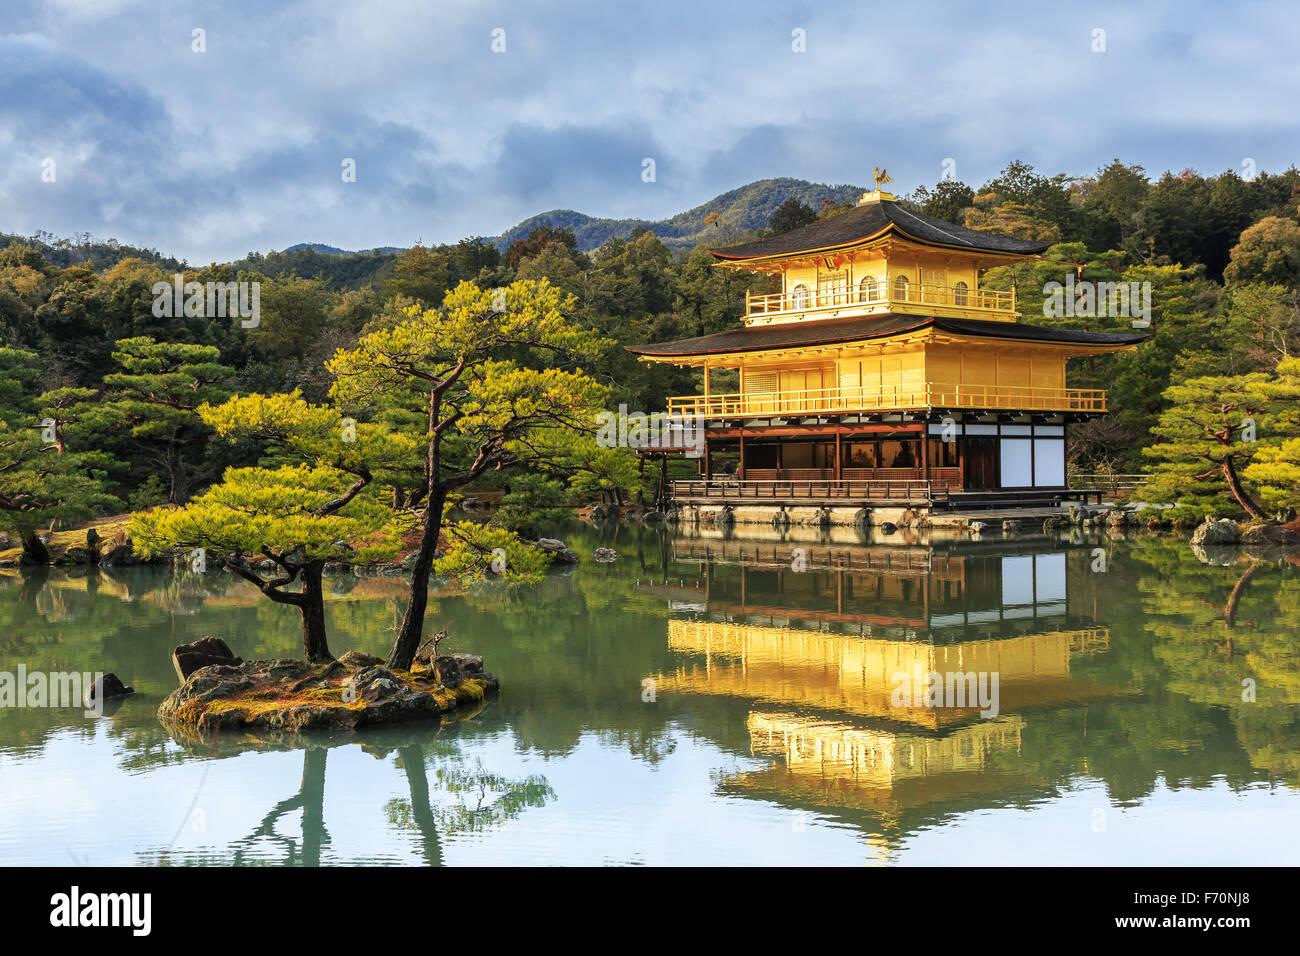 Goldener Pavillon Kinkakuji Tempel, Kyoto, Japan Stockbild